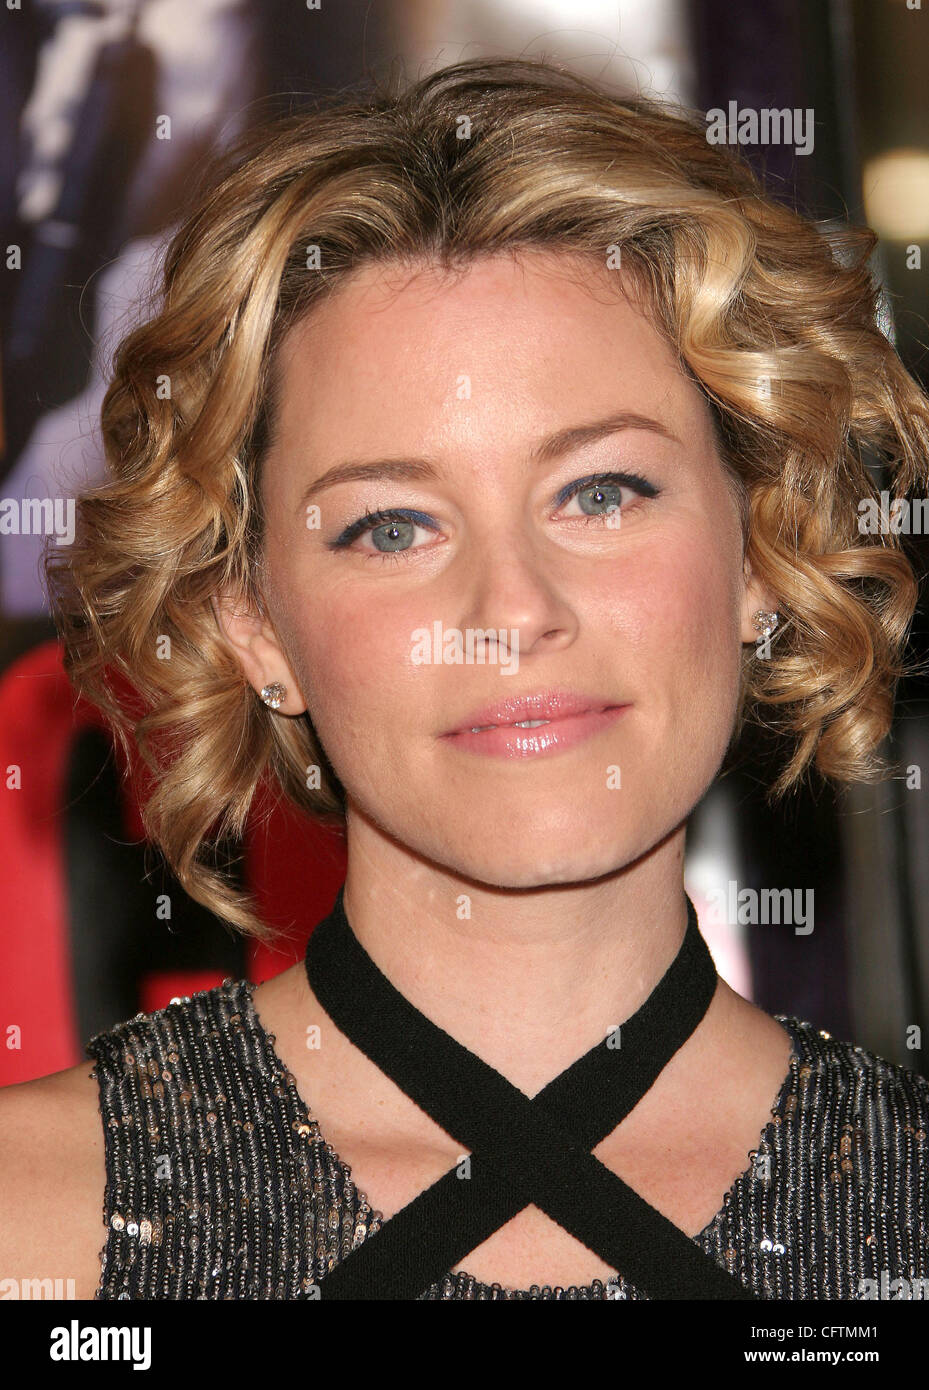 Jan 18, 2007; Hollywood, California, USA;  Actress ELIZABETH BANKS   at the 'Smokin Aces' World Premeire - Stock Image